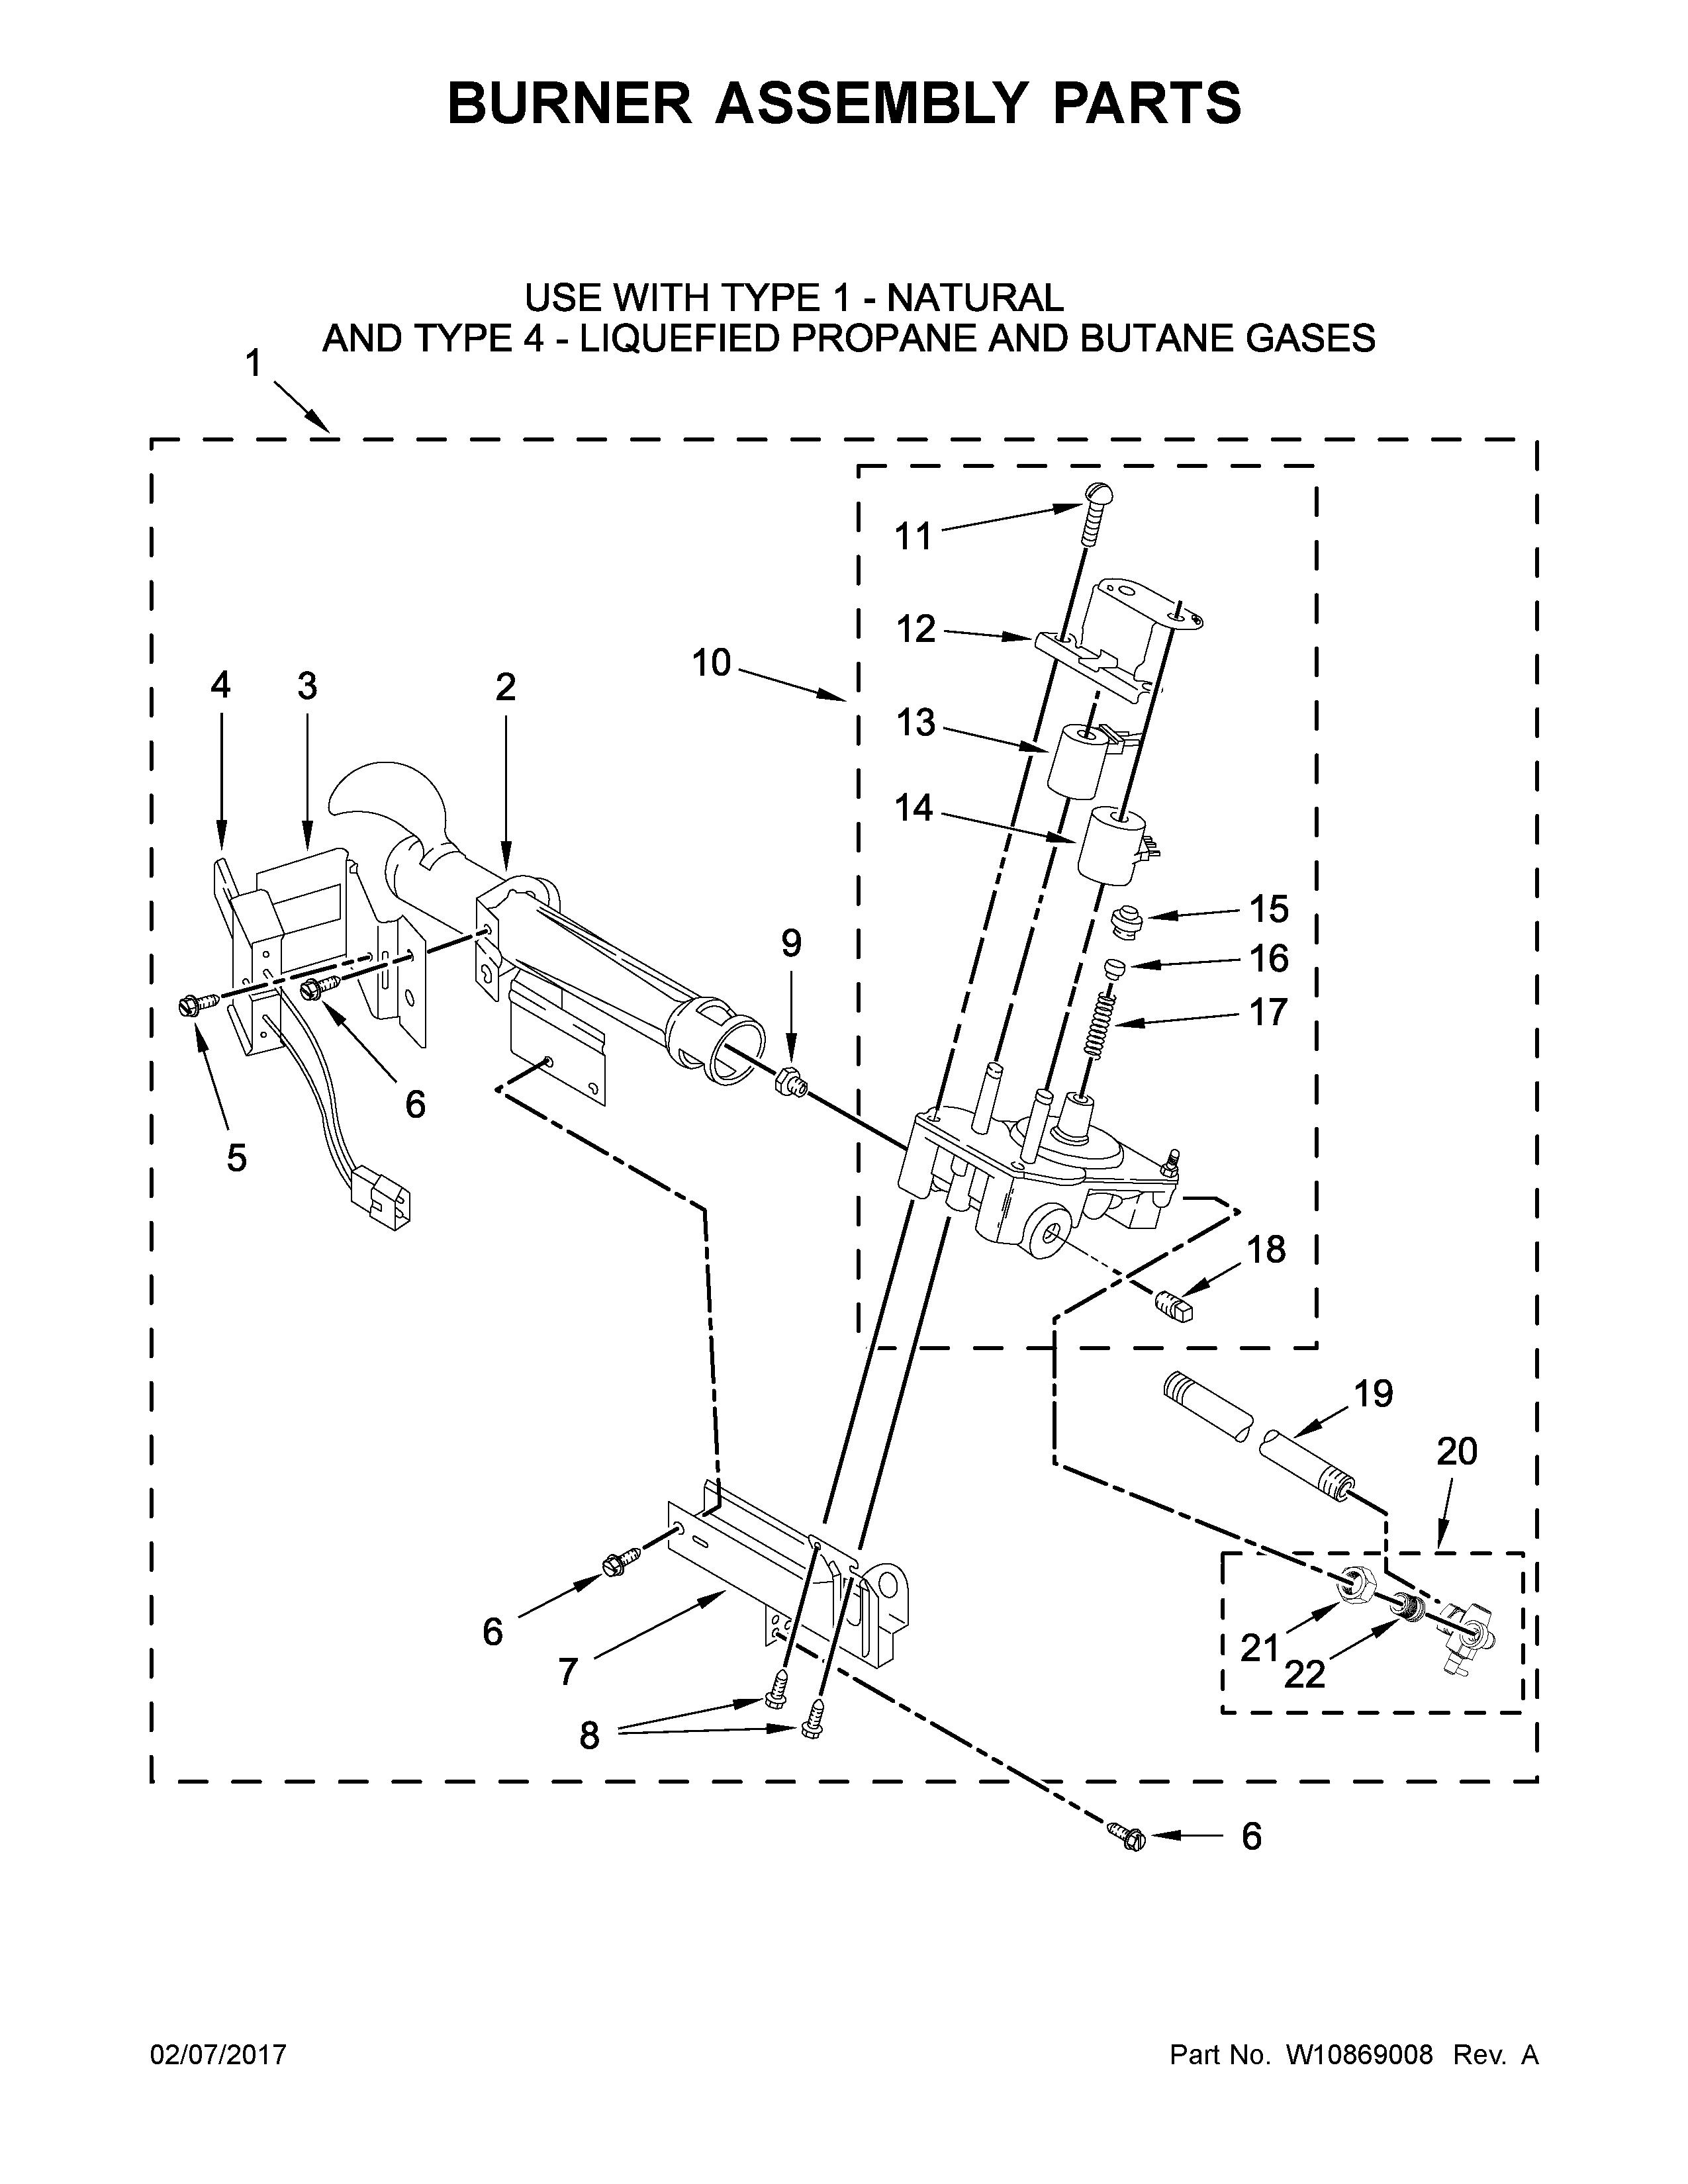 Maytag  Commercial Dryer  Burner assembly parts